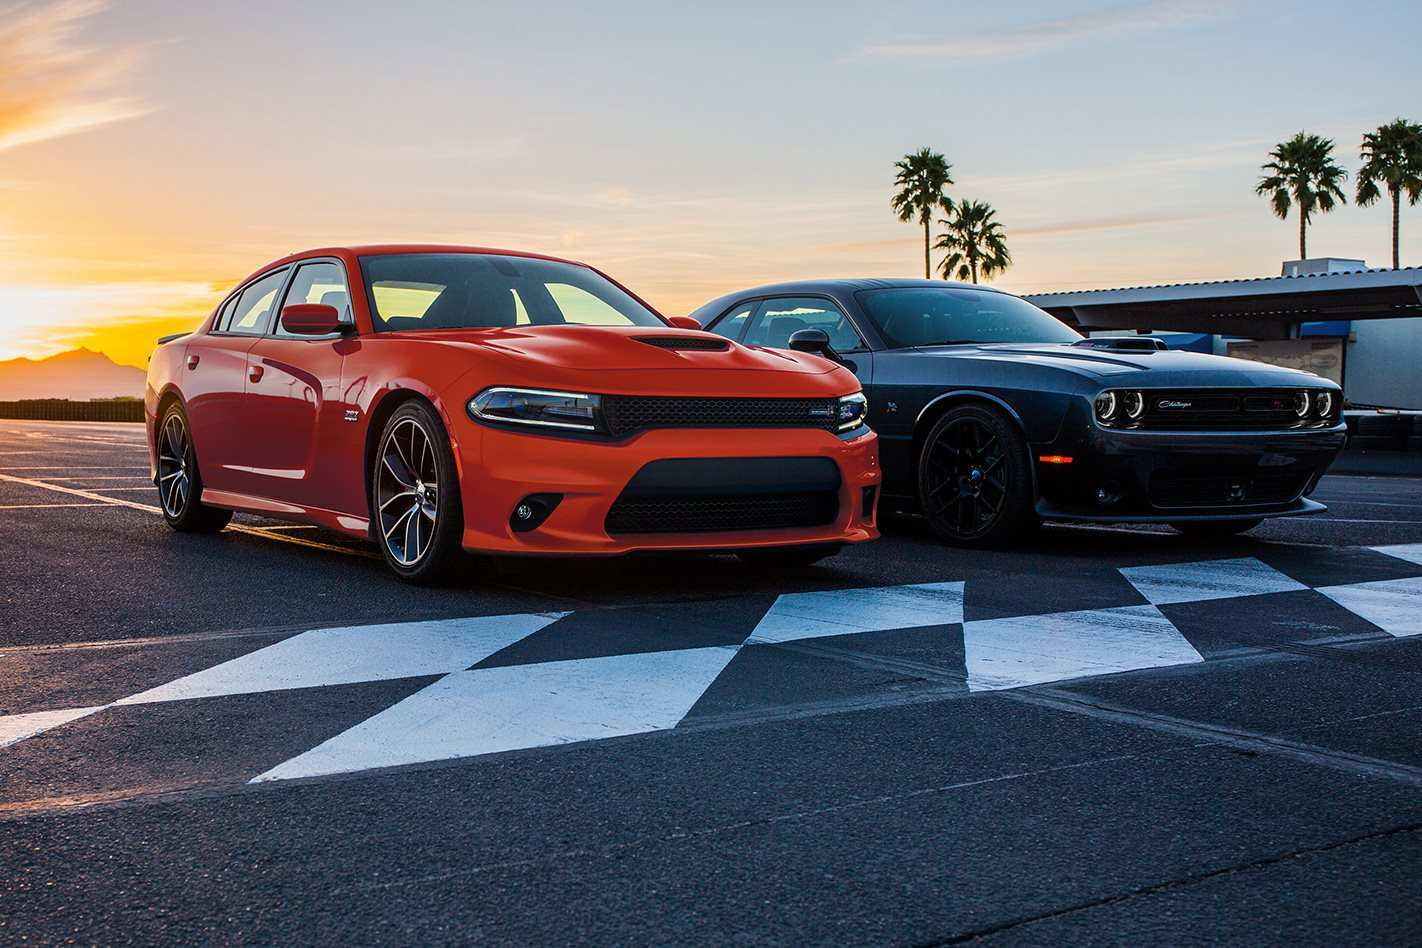 93 All New Dodge Challenger Australia 2020 Prices for Dodge Challenger Australia 2020